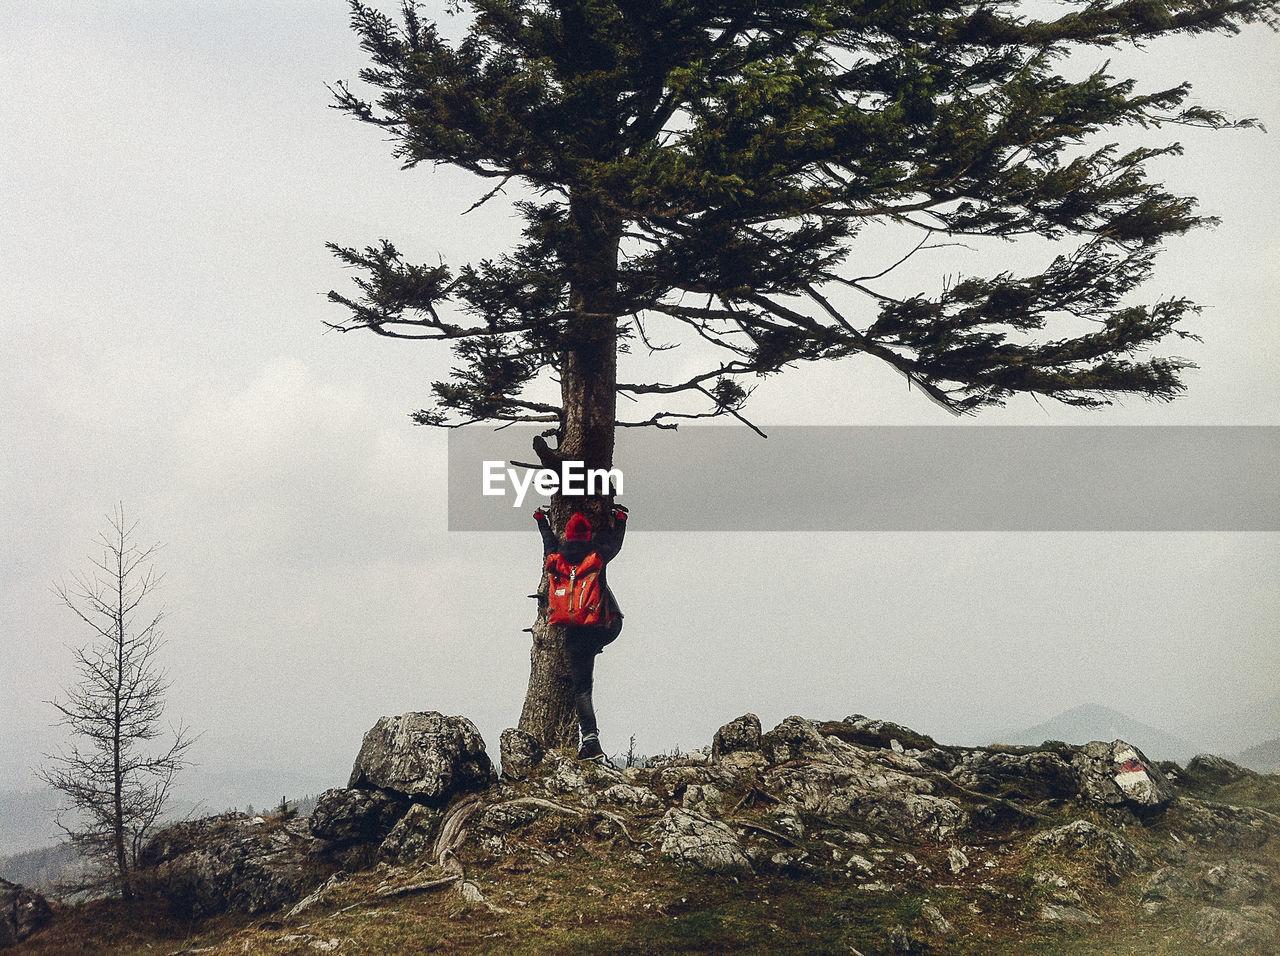 MAN STANDING ON TREE AGAINST SKY